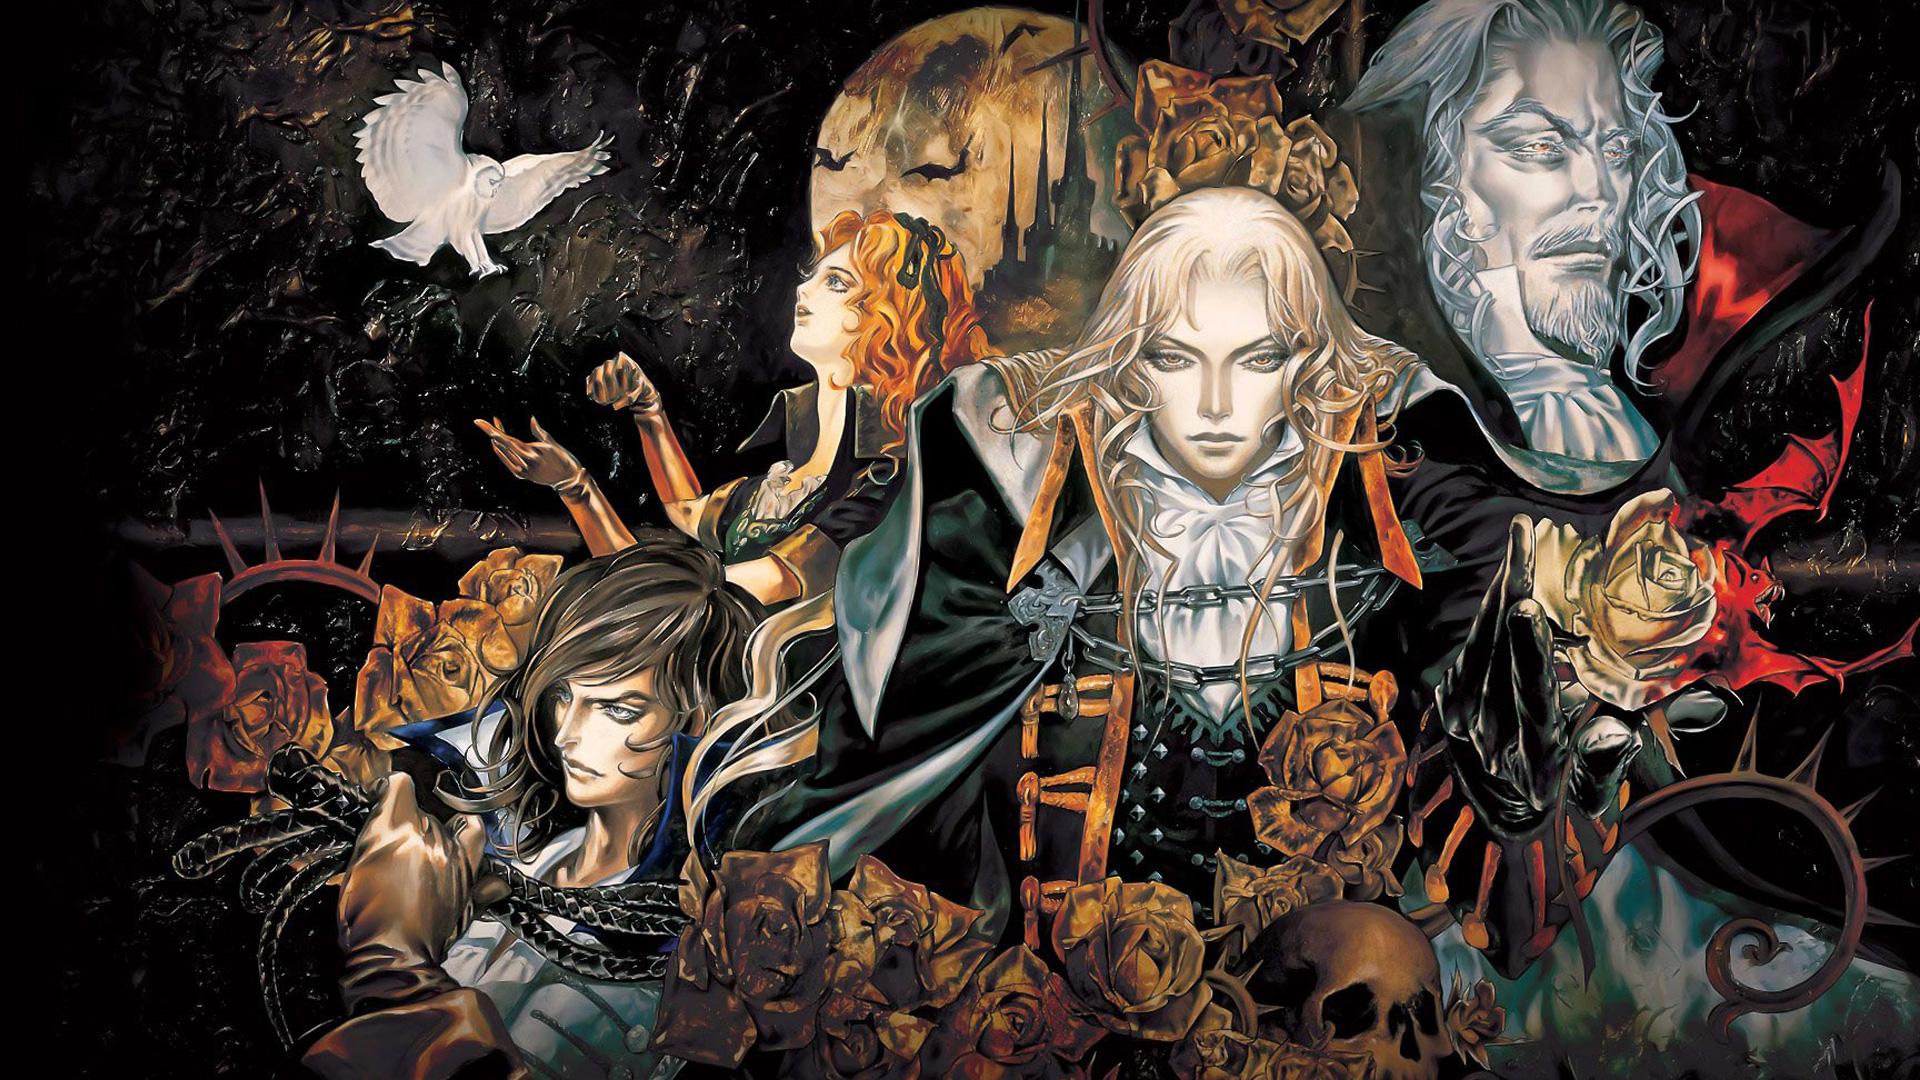 Video Games Castlevania Digital Art Artwork Symphony Of The Night